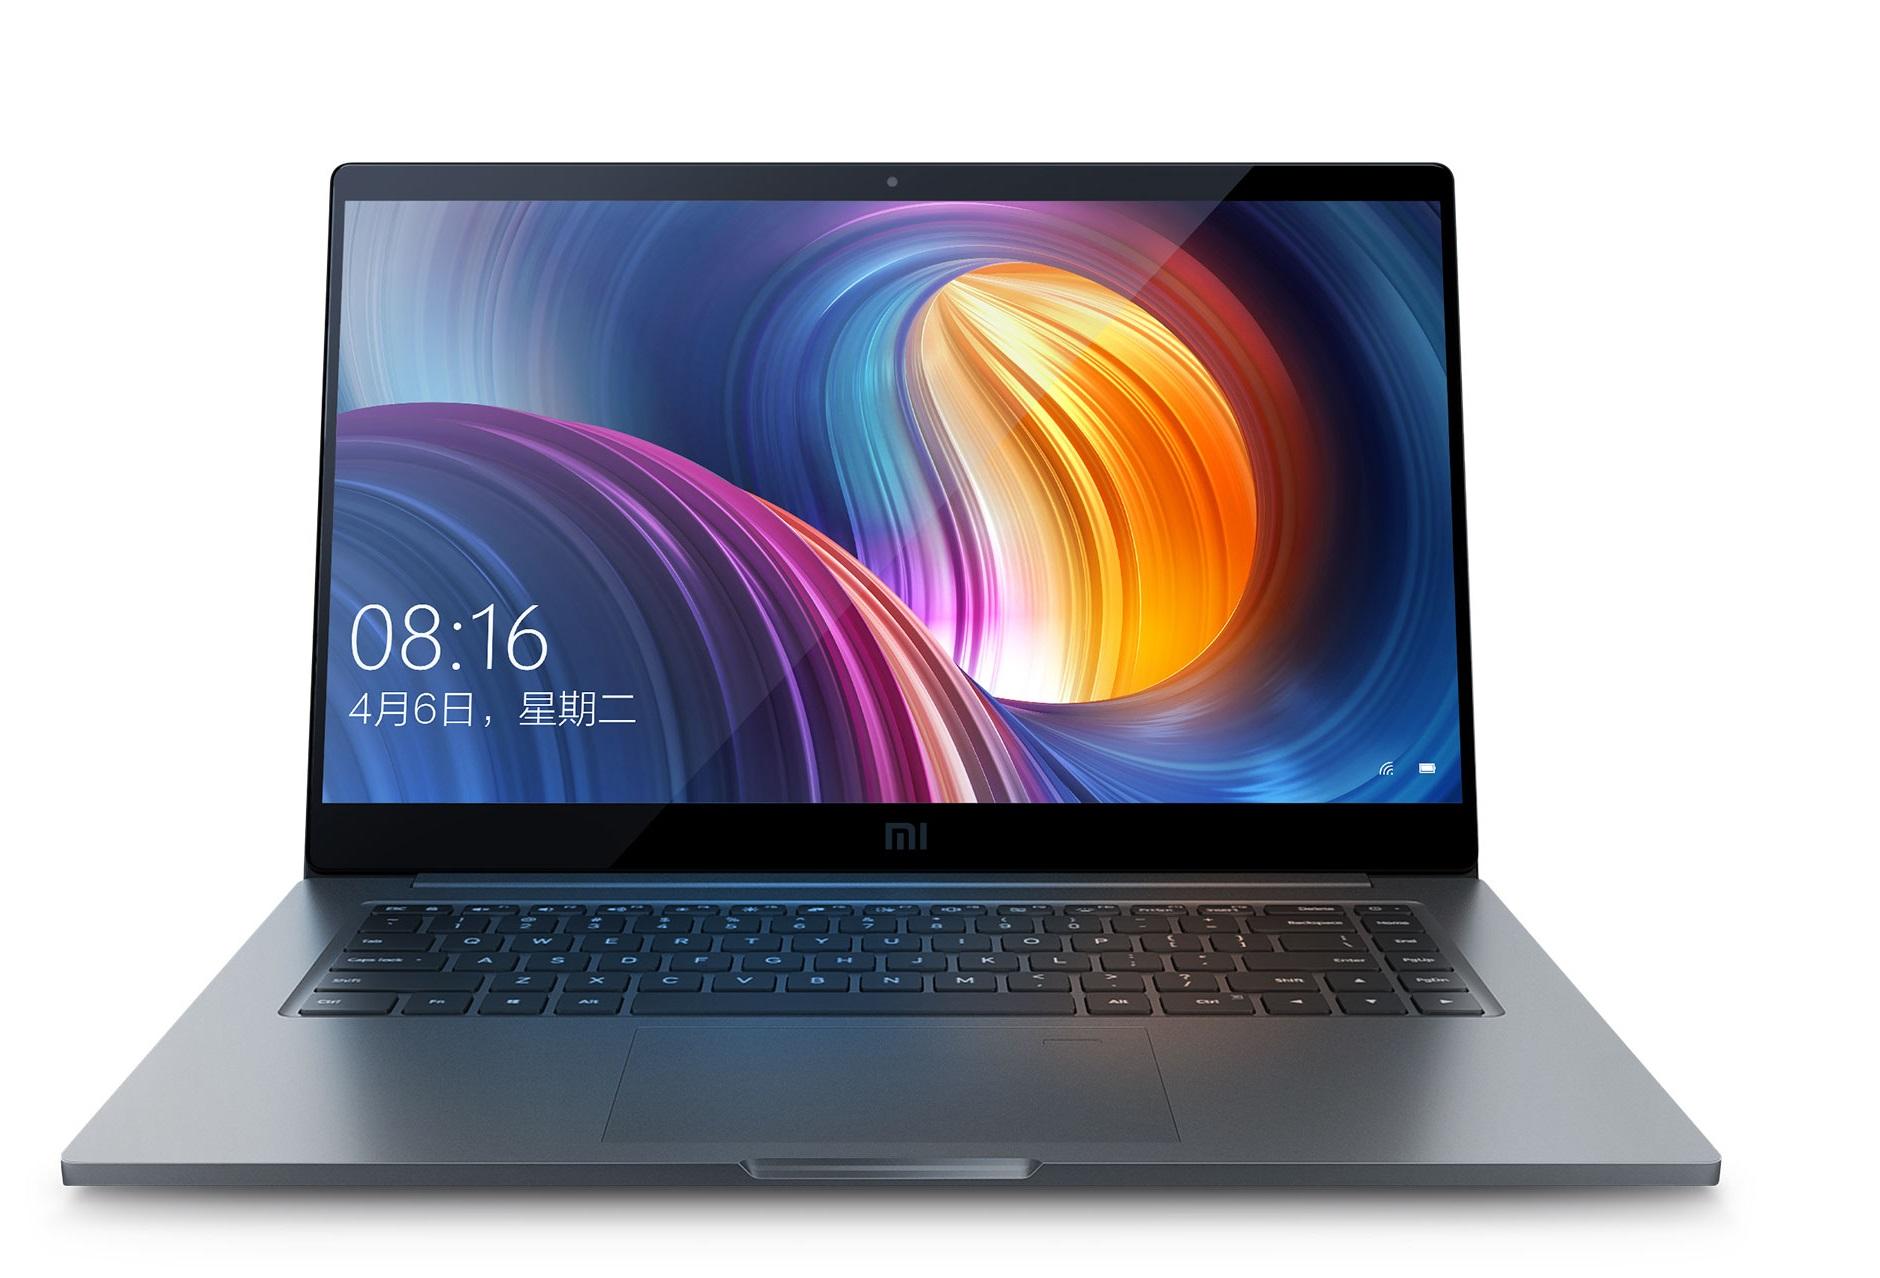 "Ноутбук Xiaomi Mi Notebook Pro 15.6"" (Intel Core i5 8250U 1600 MHz/1920x1080/8Gb/256Gb SSD/NVIDIA GeForce MX150/Win10 Home RUS) серый"